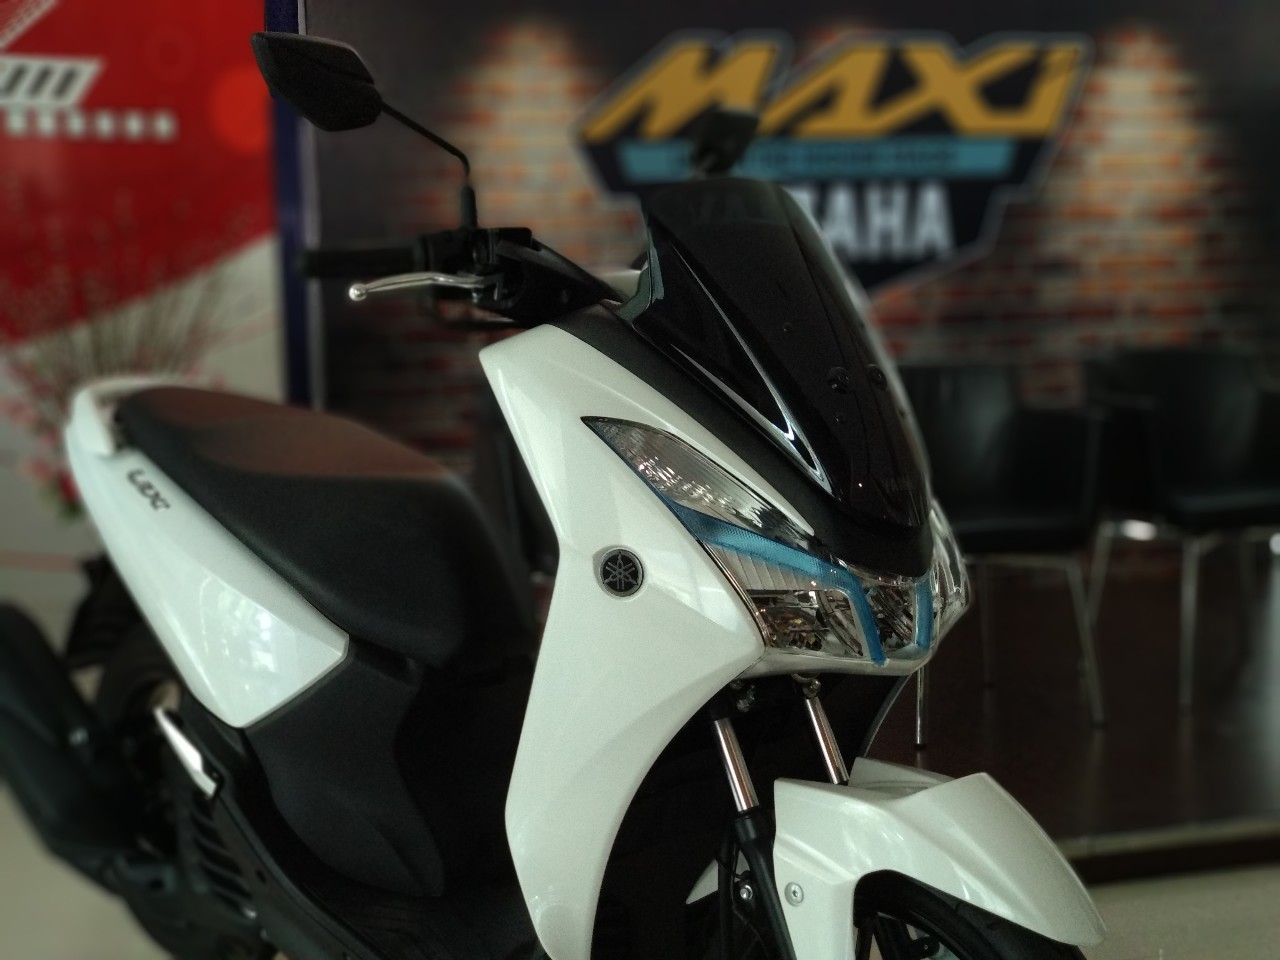 Motor Matic Terbaru Dari Yamaha Siap Dipasarkan